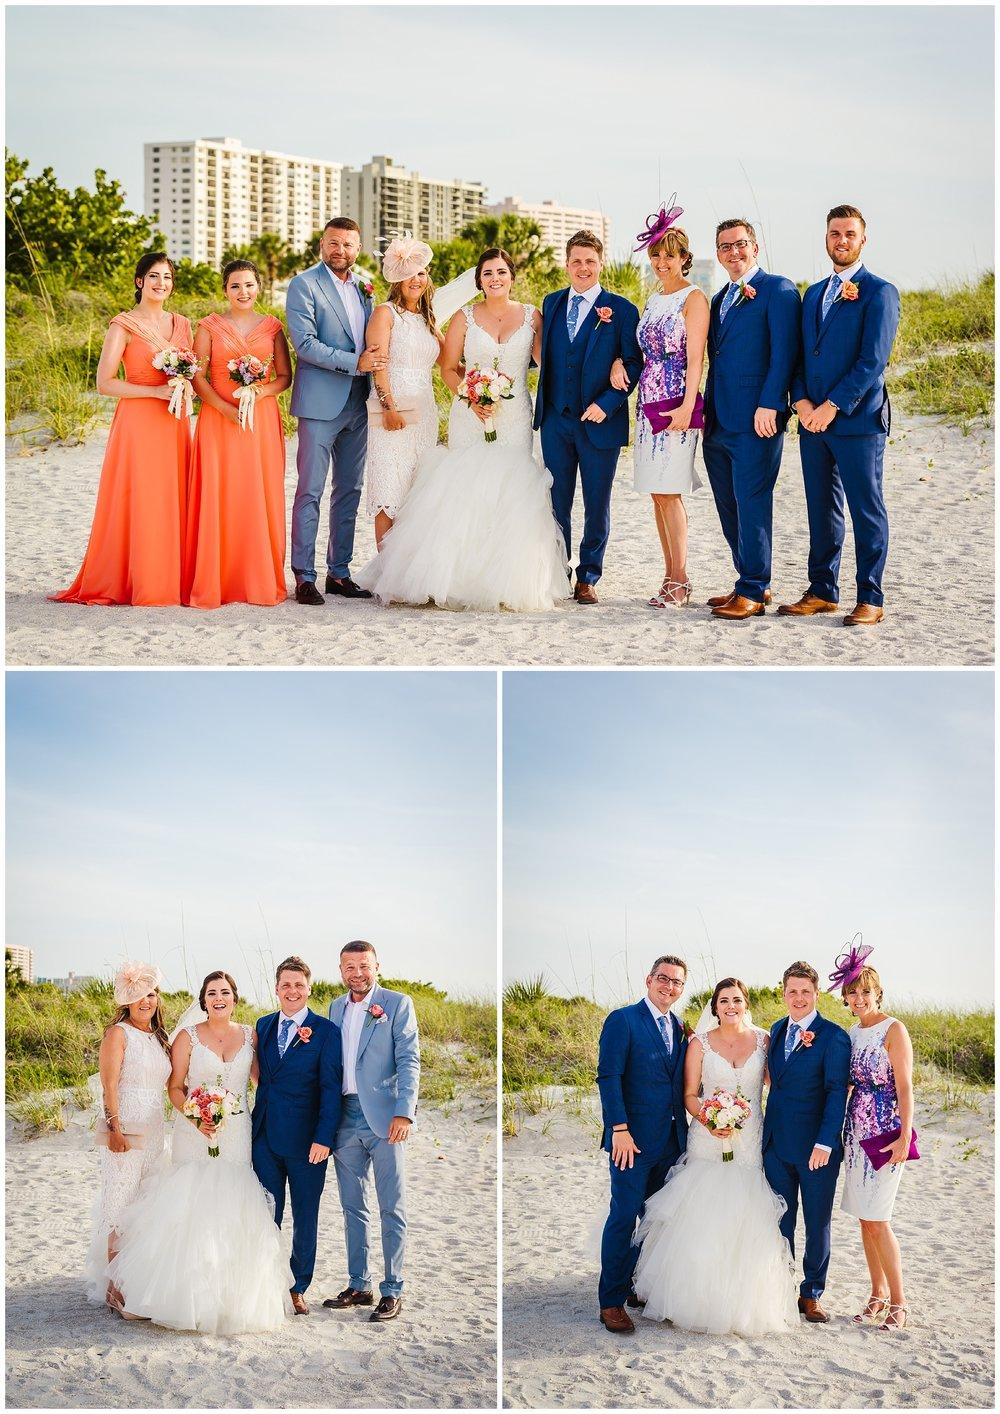 Clearwater-destination-wedding-photographer-jimmy-choo-yves-st-laurent-sunset_0090.jpg